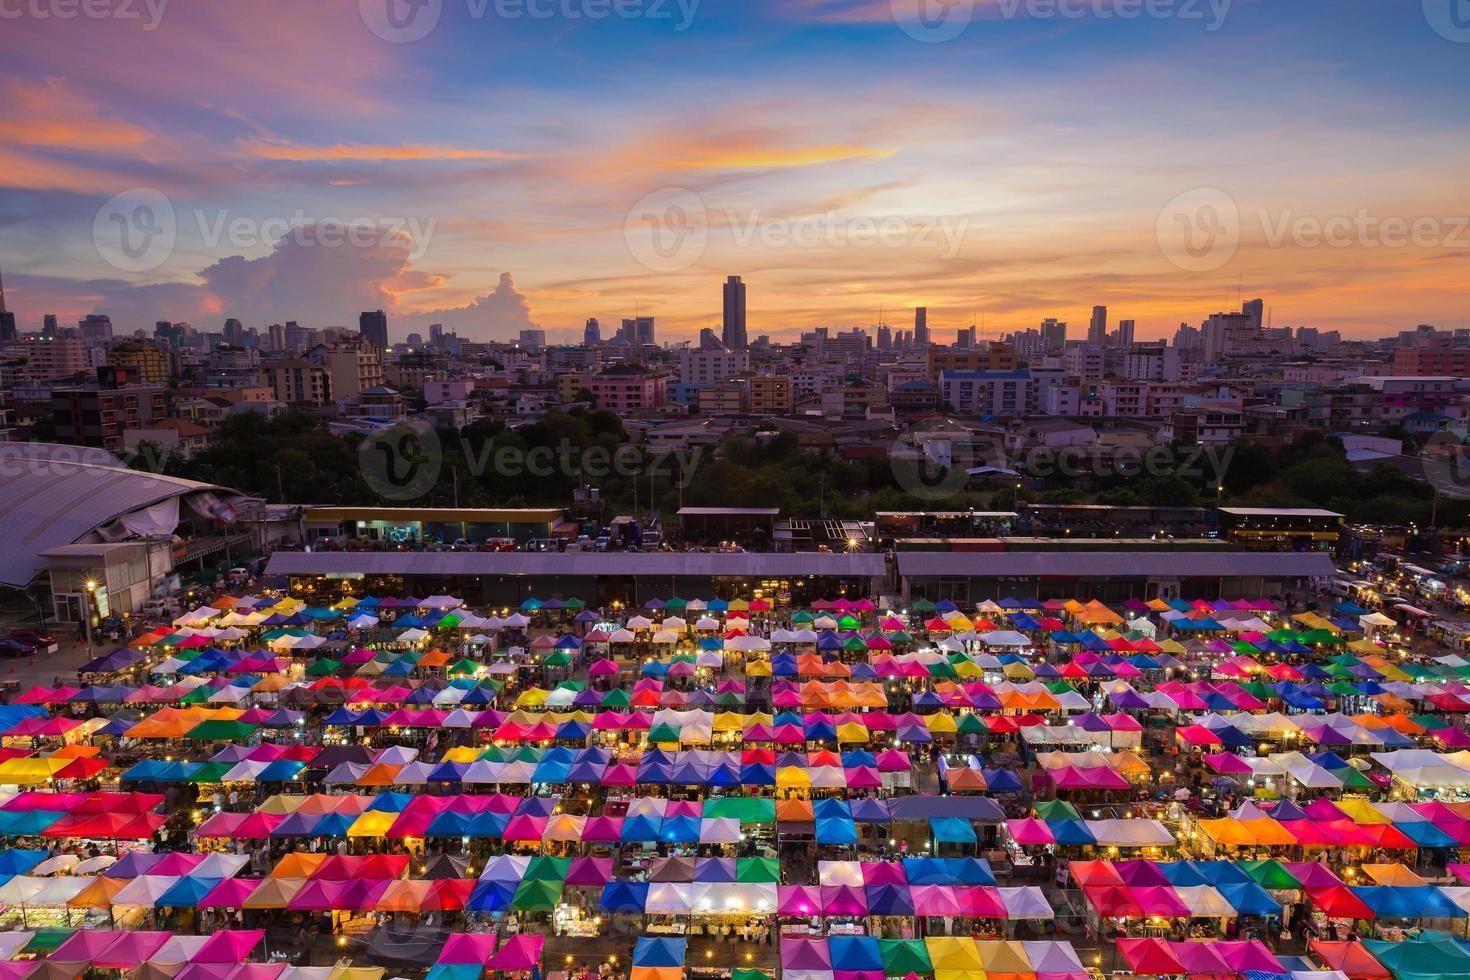 Bangkok Flea market aerial view photo